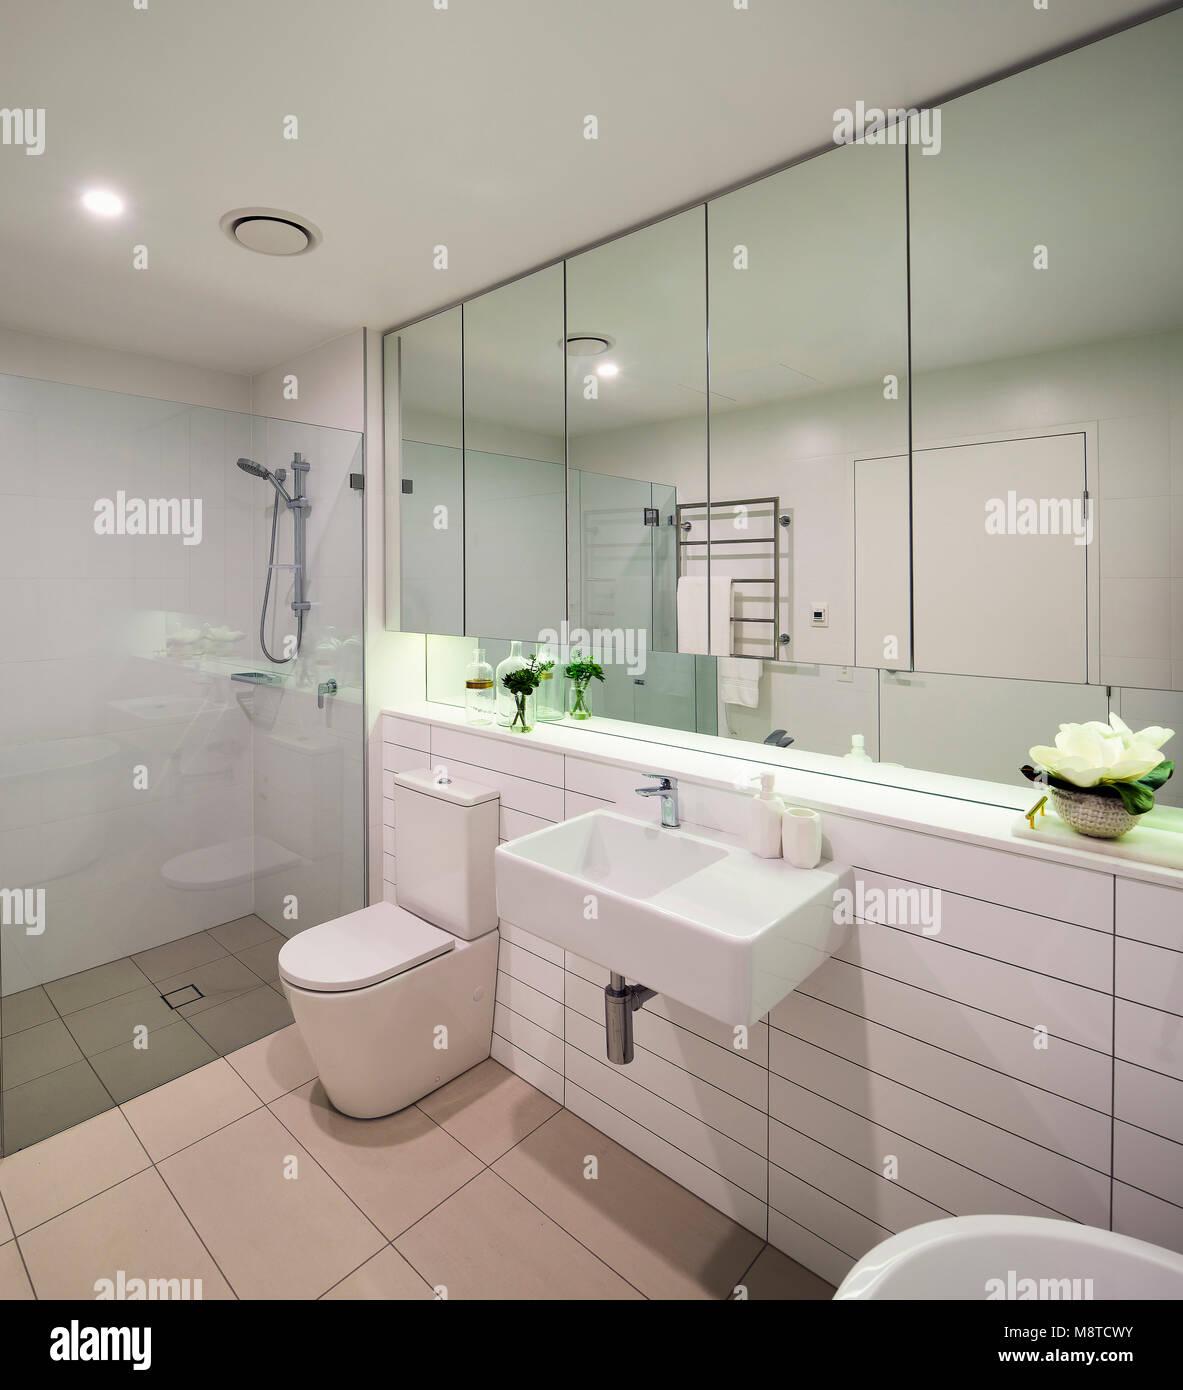 Apartment Bathroom Lotus Apartments Sydney Australia Architect Stock Photo Alamy